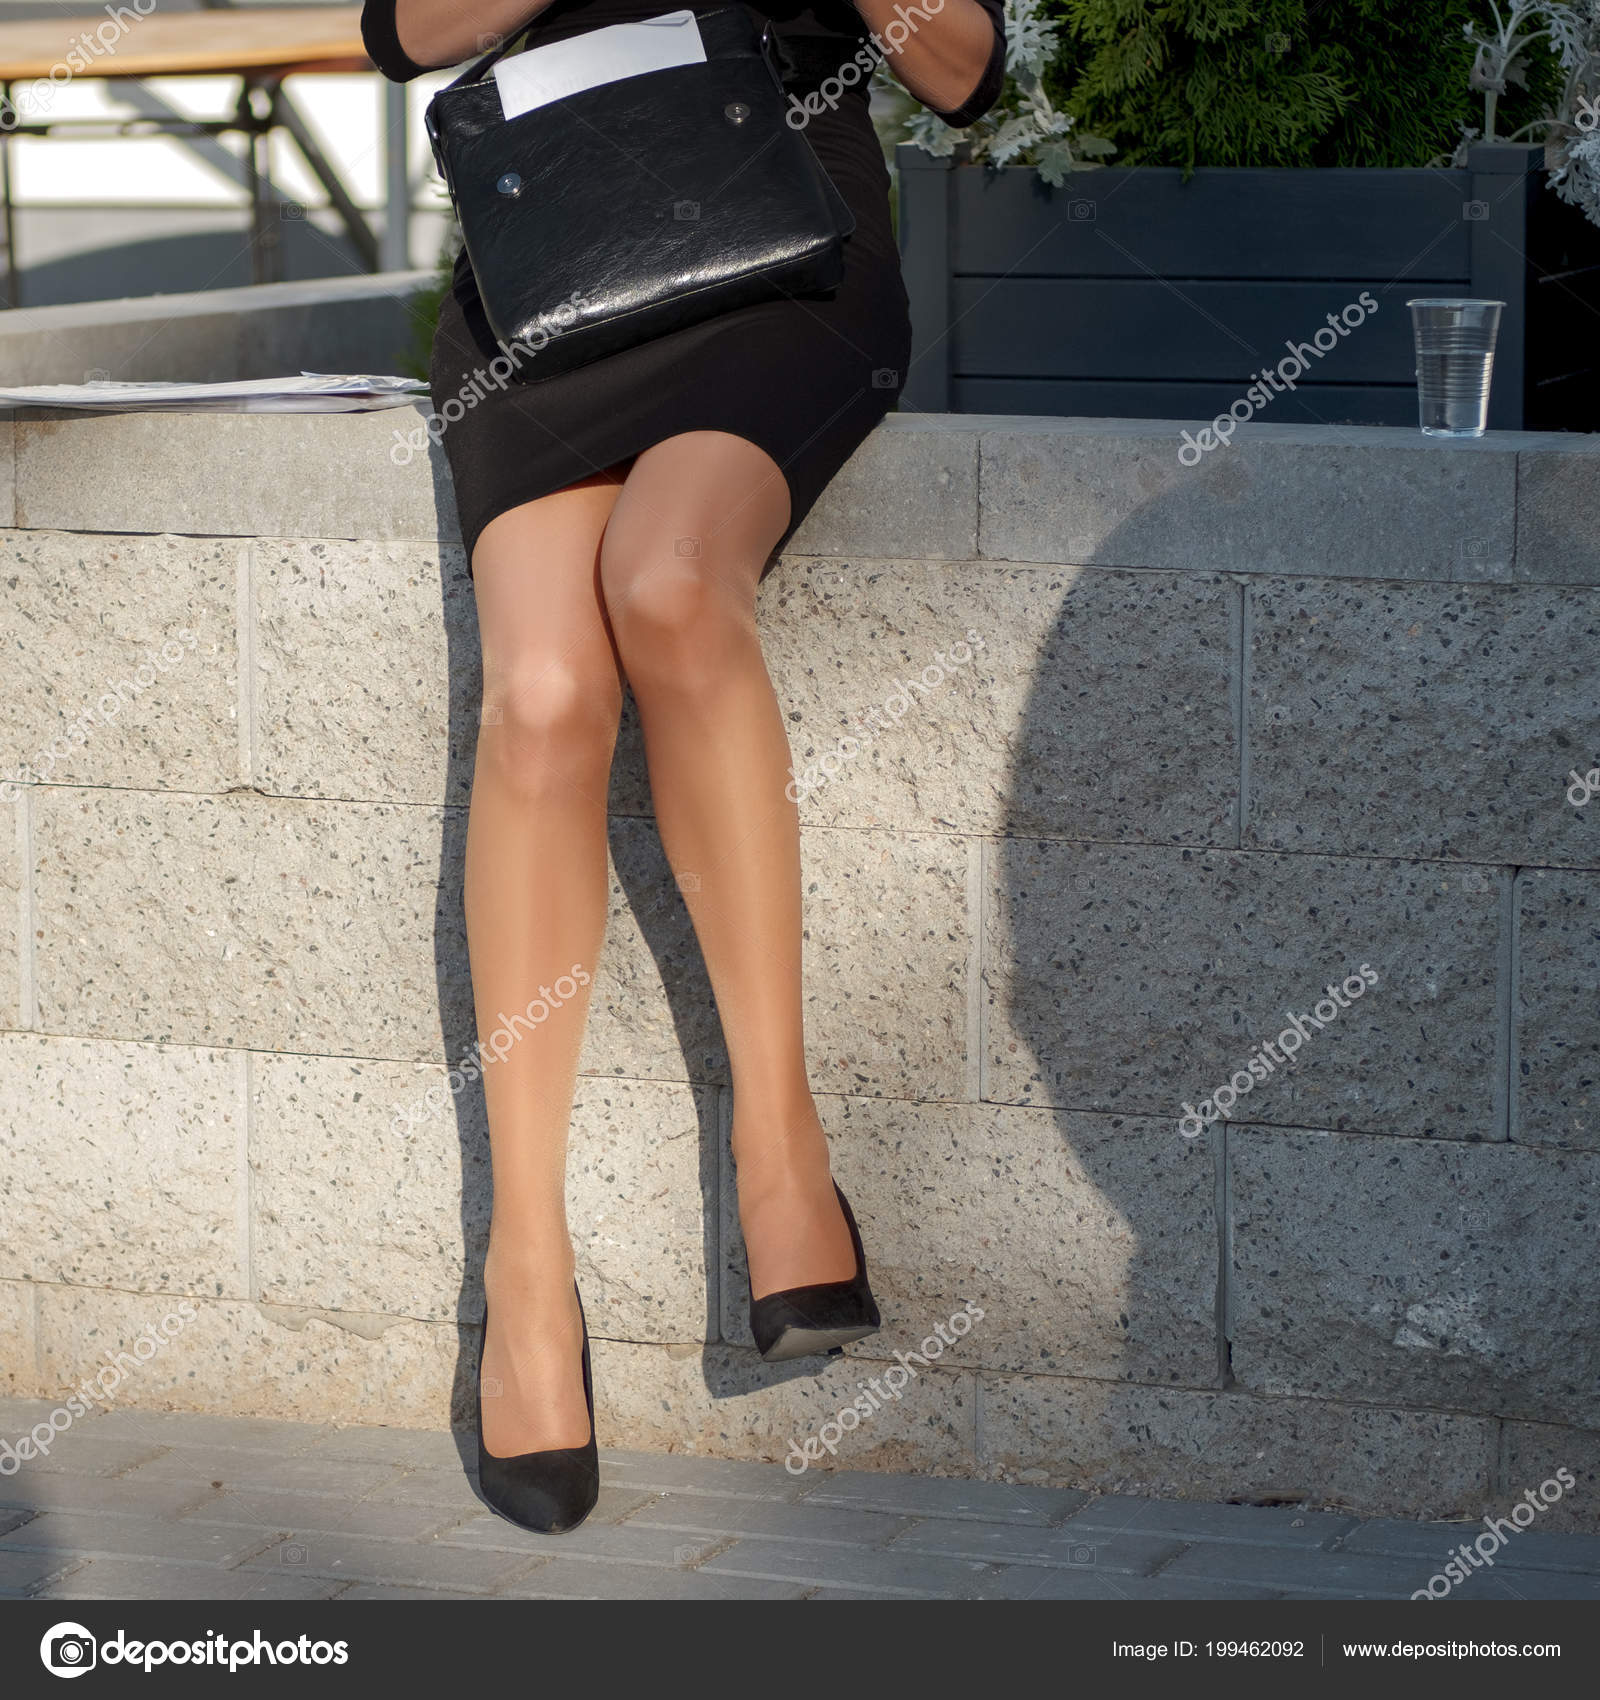 Сексуальные женские ножки на работе